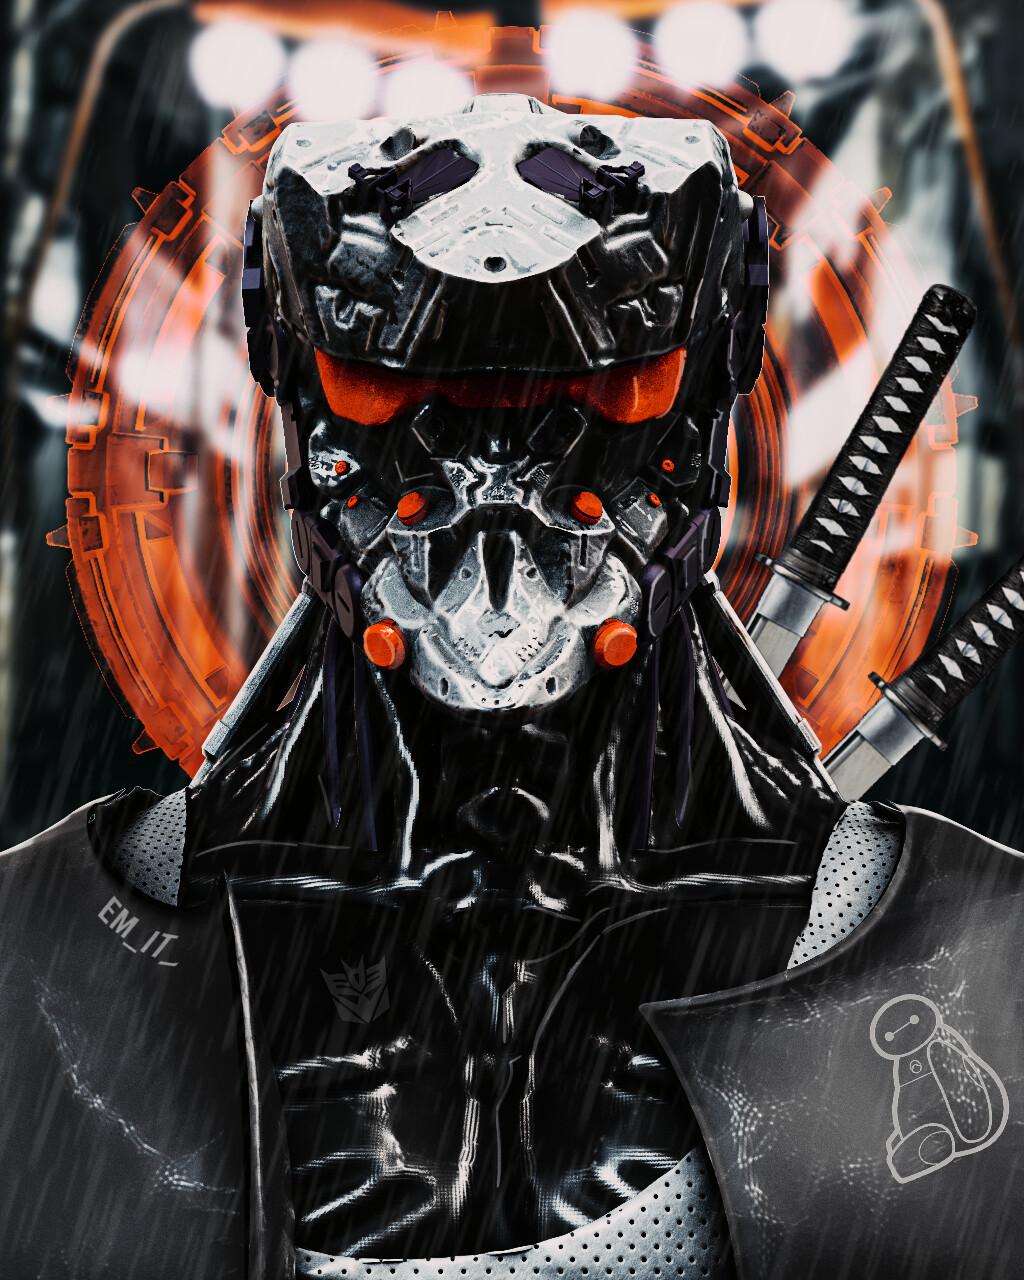 Artstation Mech Samurai Yasuke Amit Choudhary Nobunaga awarded yasuke, a valiant and mighty fighter, the prestigious status of samurai. artstation mech samurai yasuke